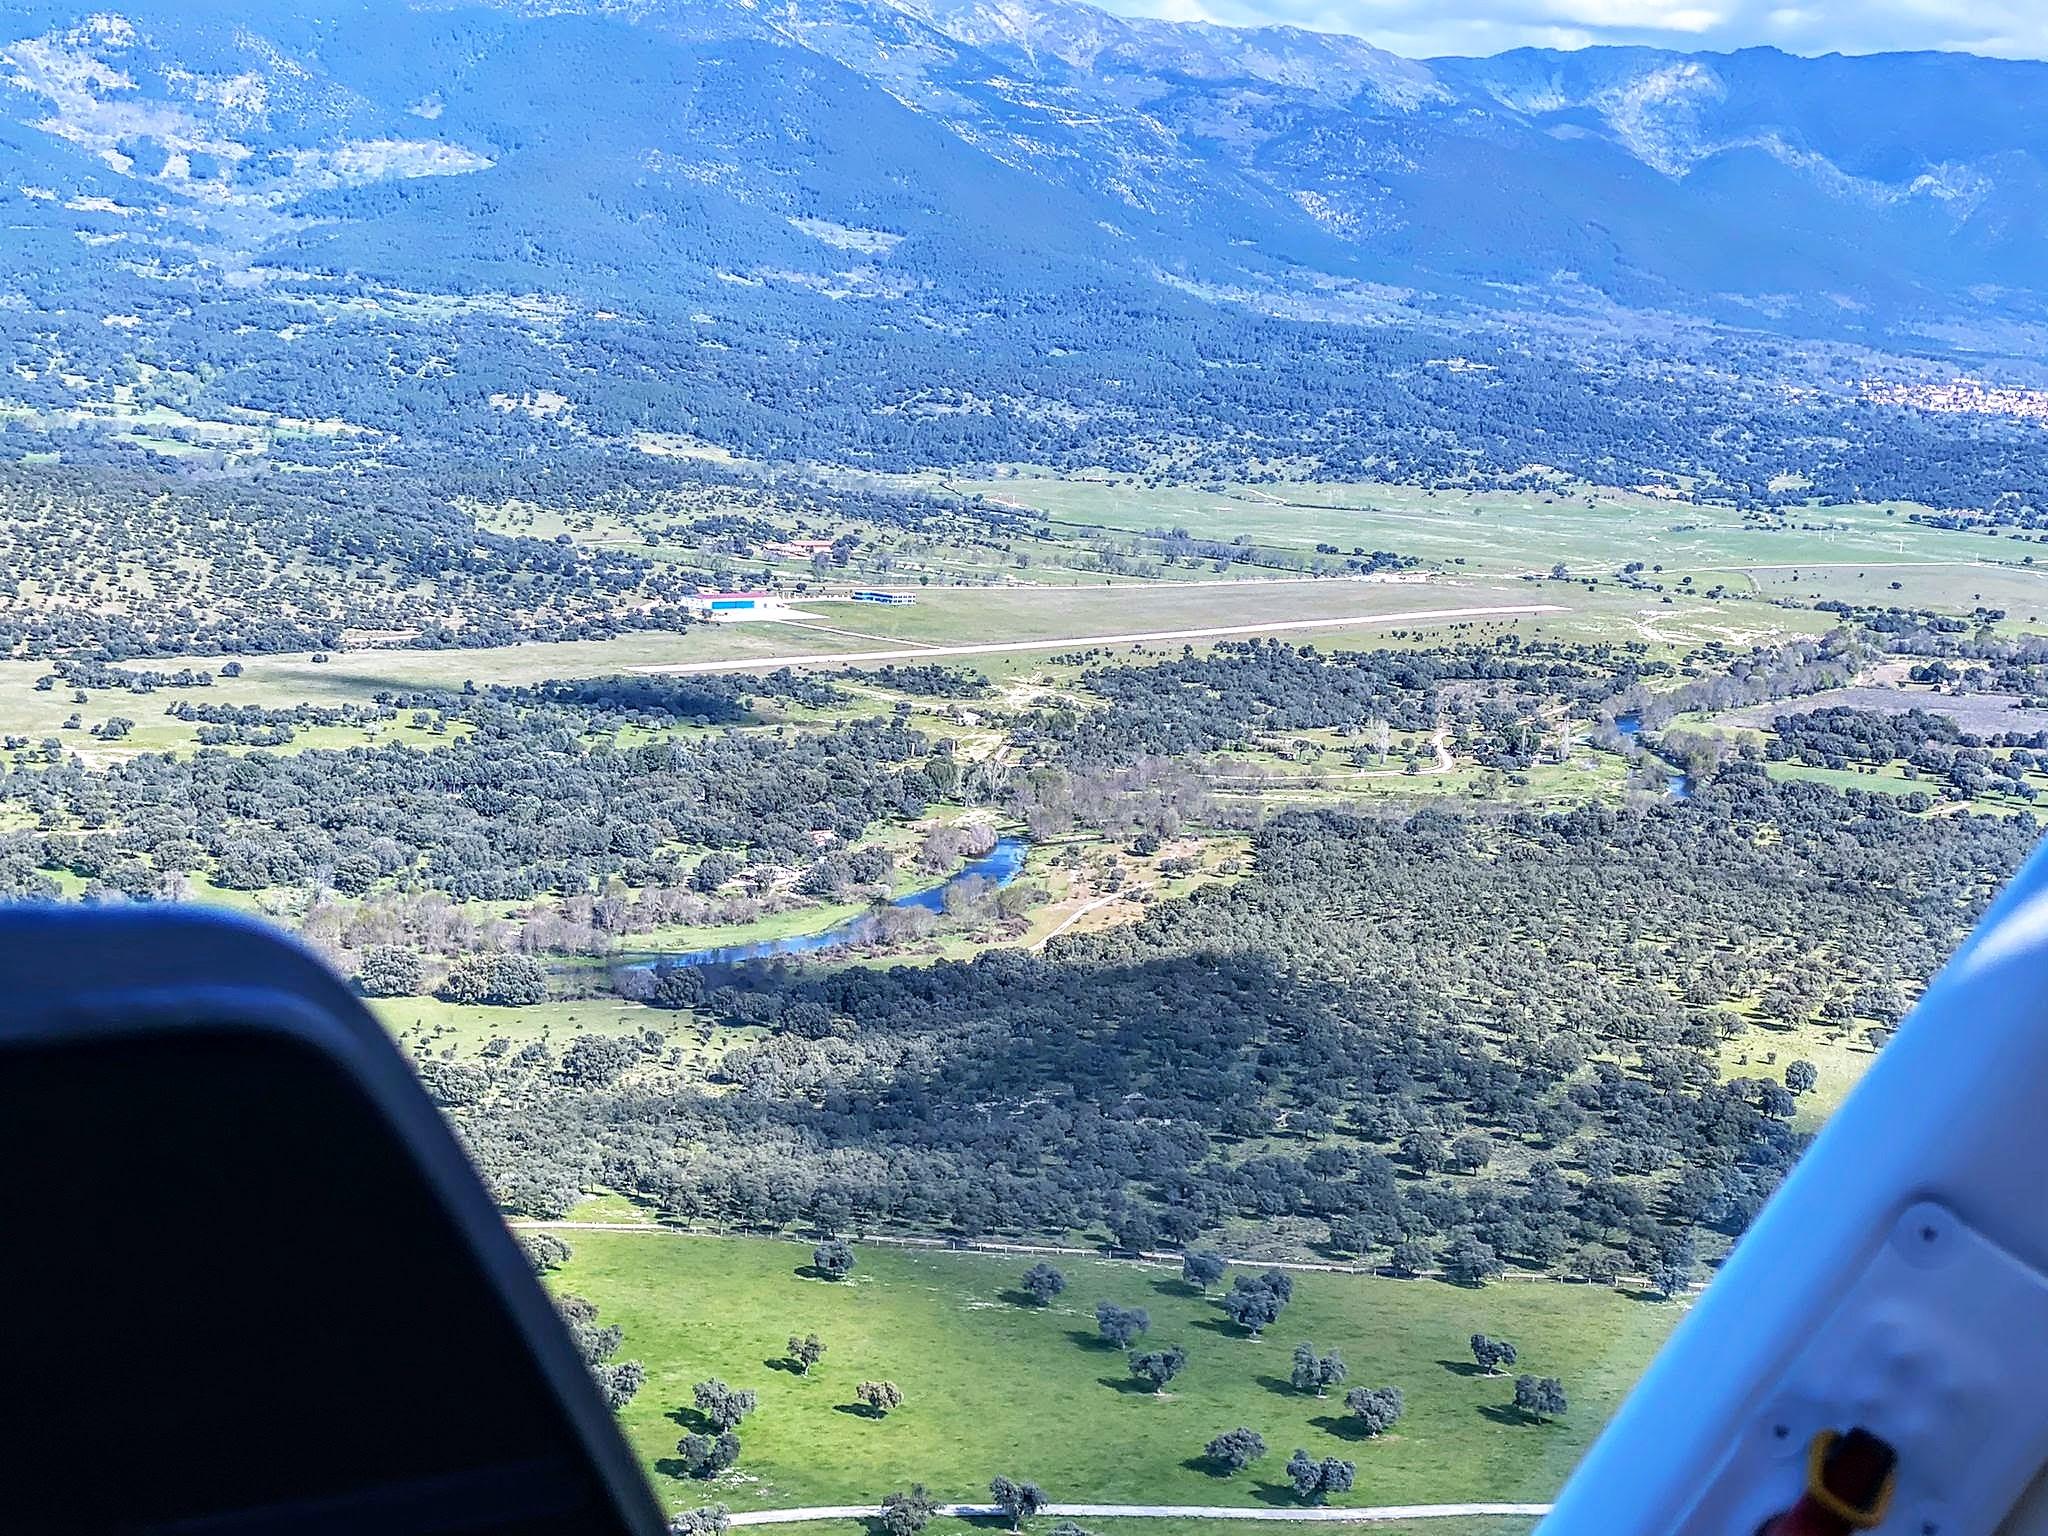 Aeródromo La Iglesuela LETI. El Tietar